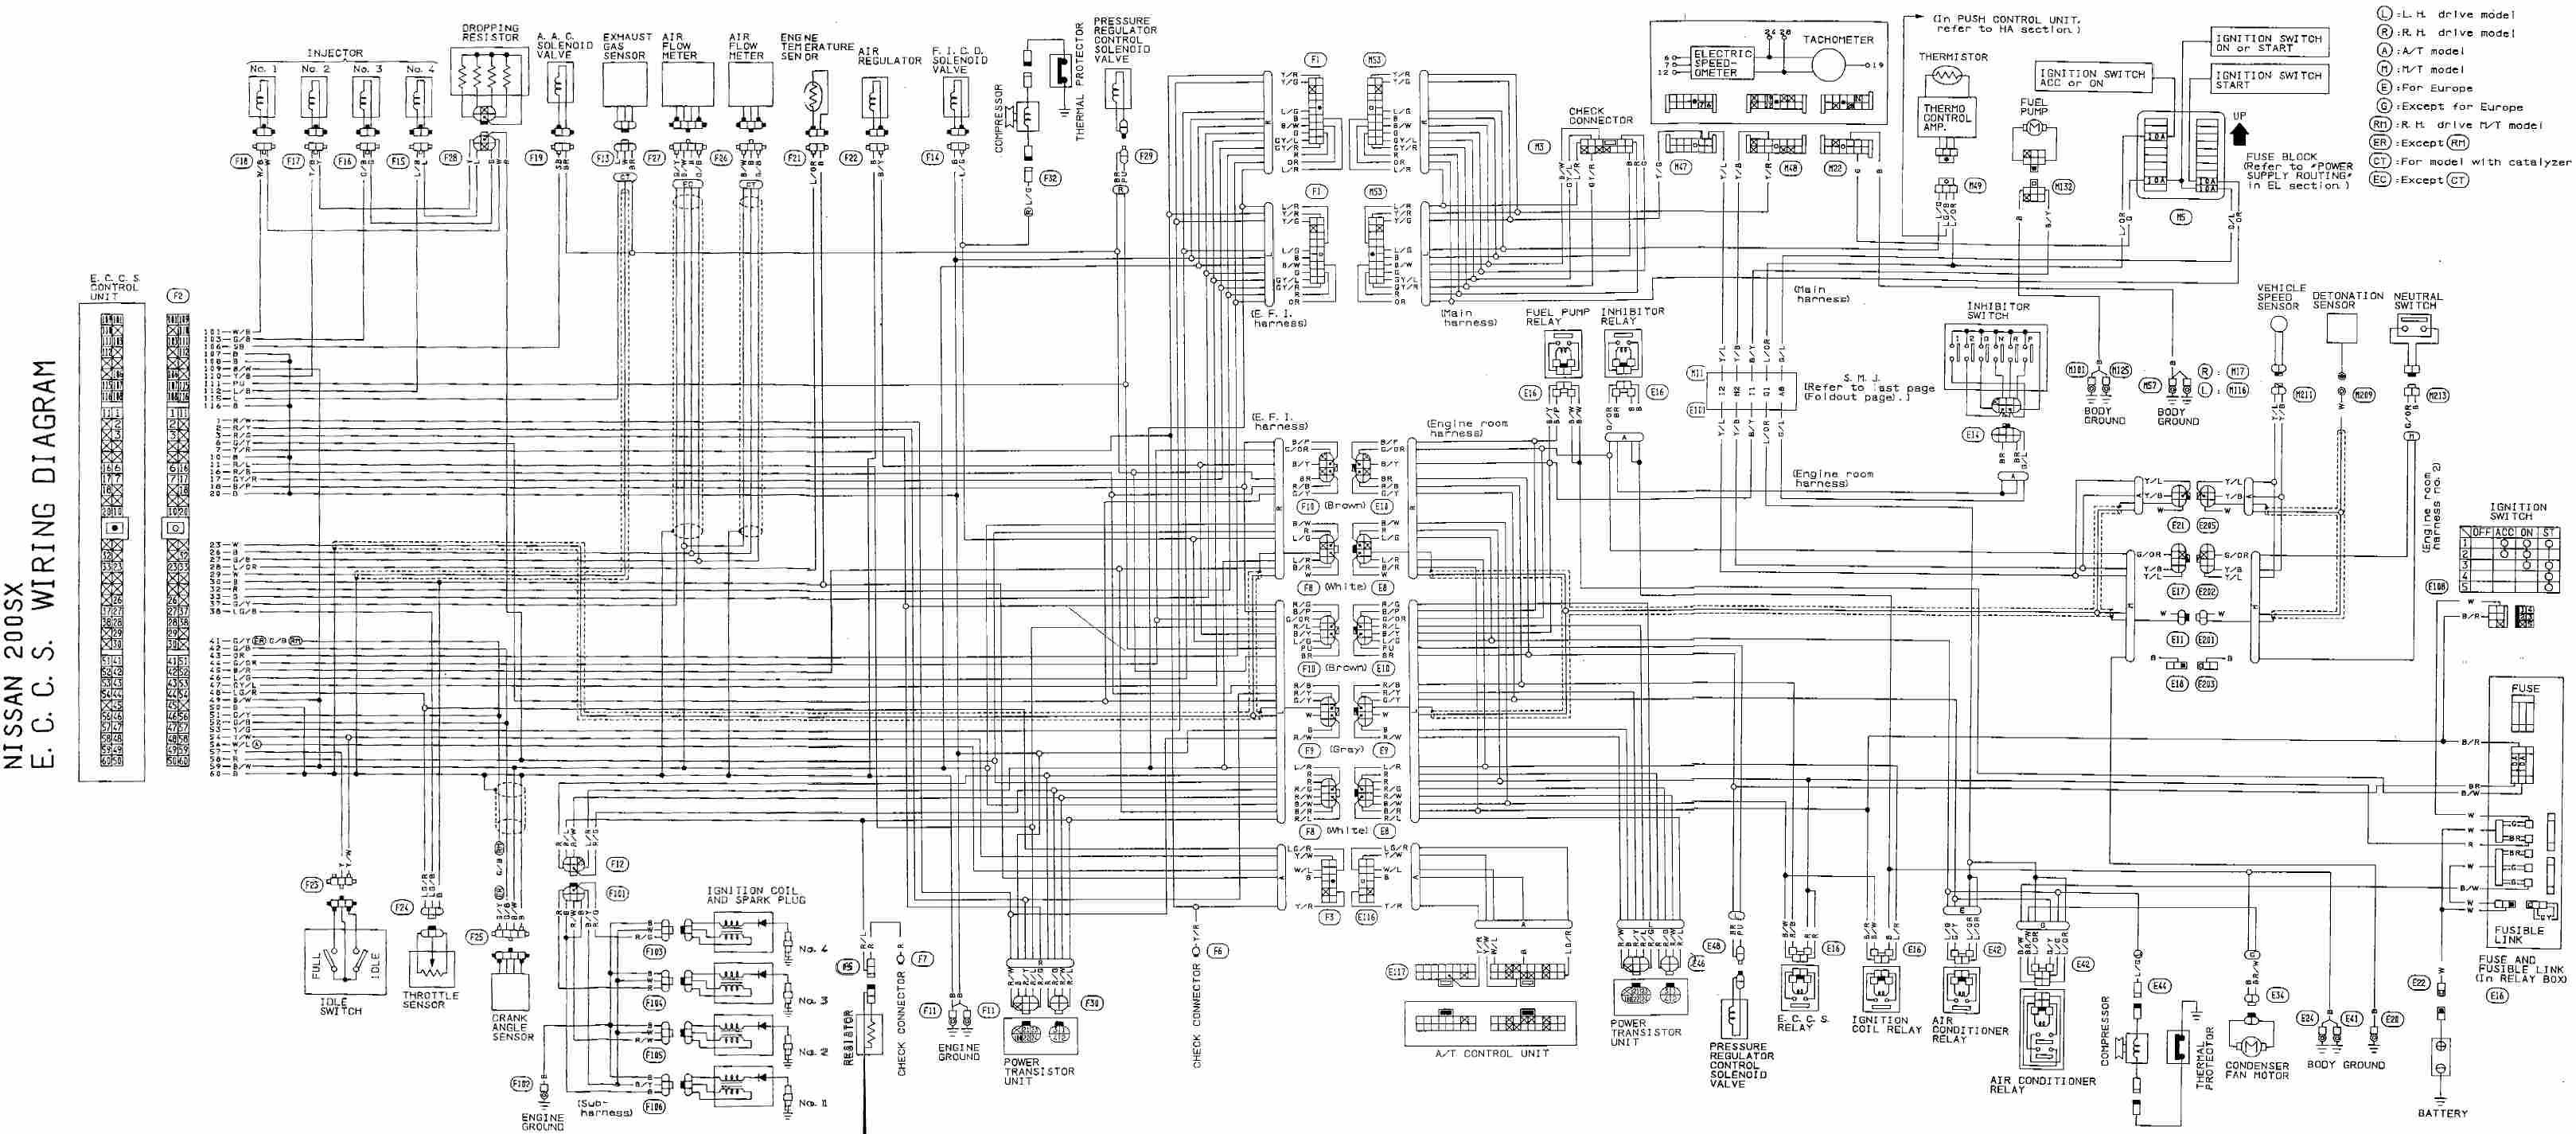 small resolution of 2014 nissan nv stereo wiring diagram wiring librarynissan wiring diagram wiring diagrams box nissan lighting wiring